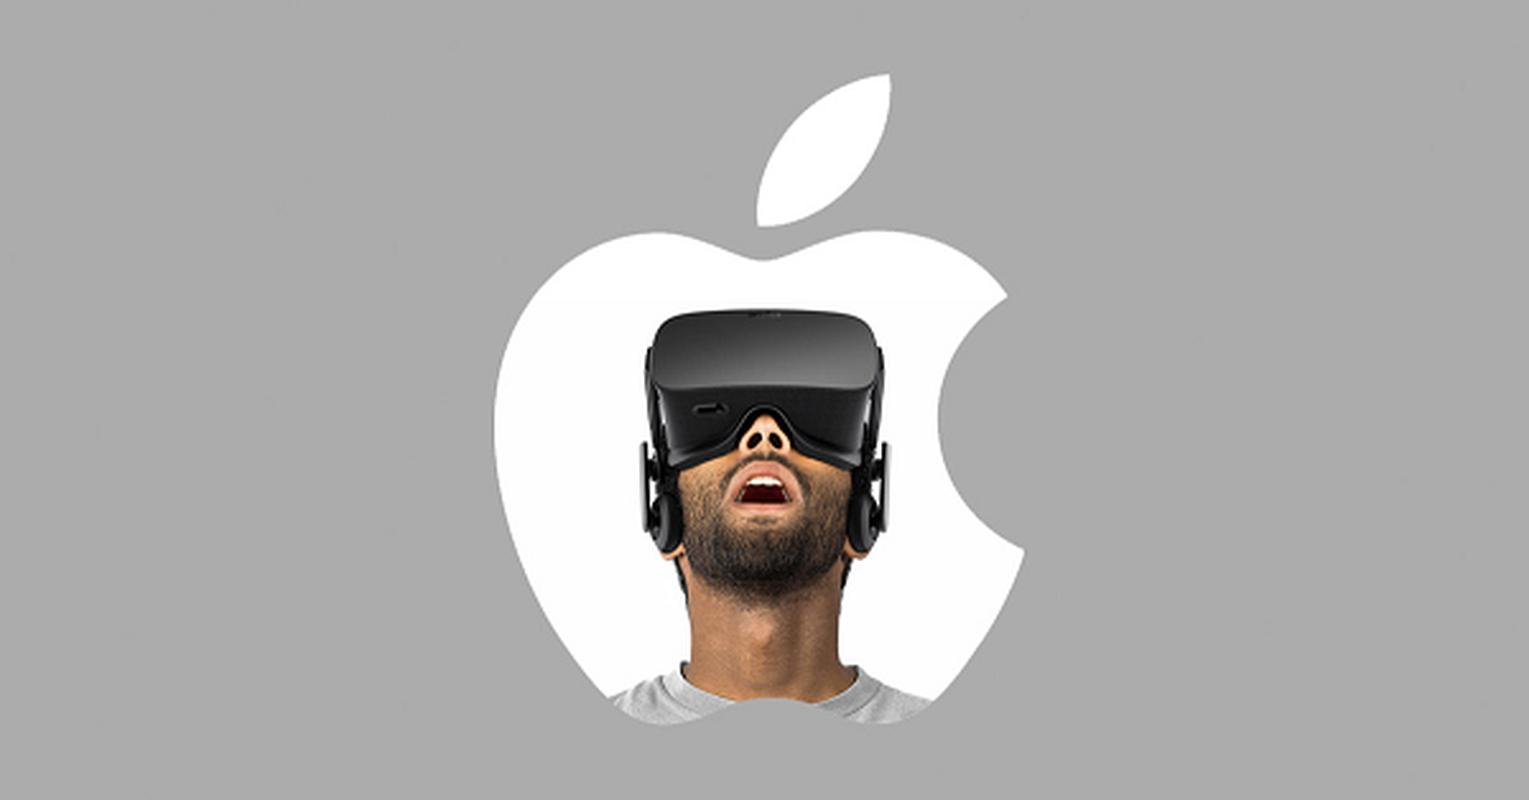 Kinh thuc te ao VR cua Apple chi duoc ban moi ngay... 1 kinh-Hinh-5